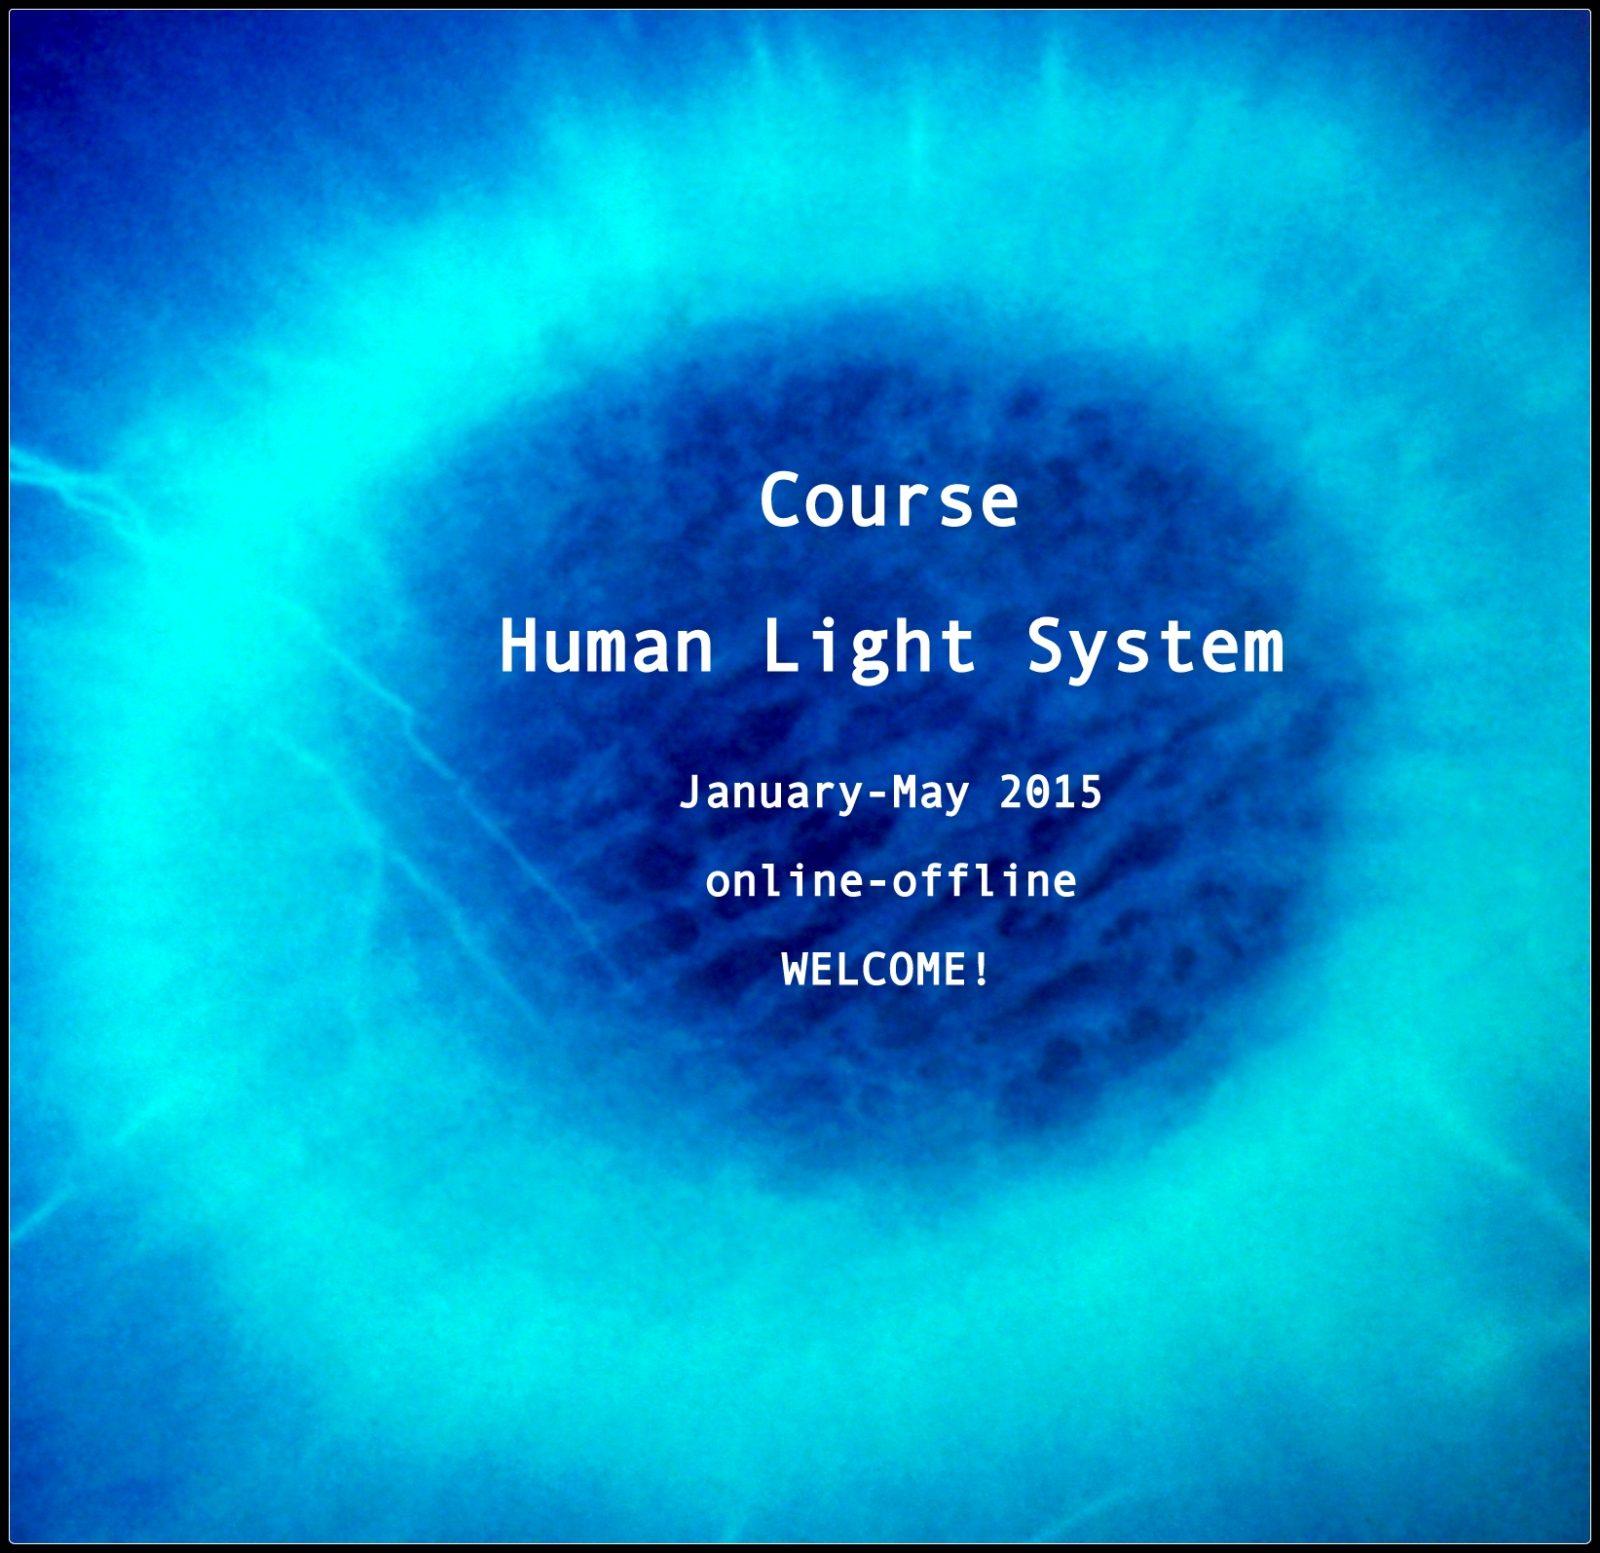 Human Light System Course – Translighters technologies